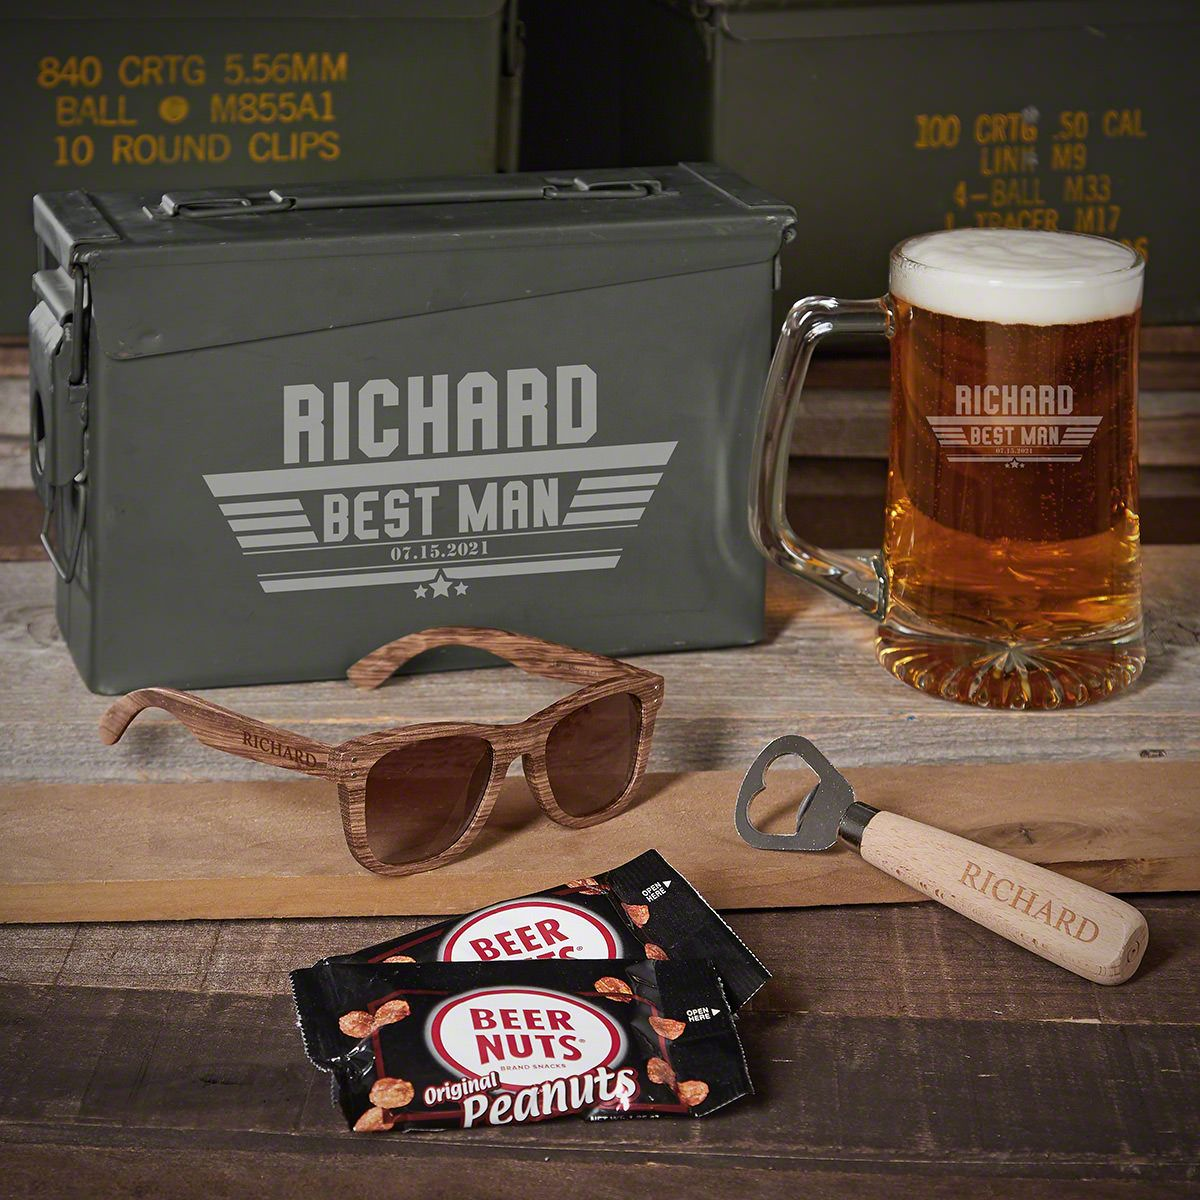 Maverick 30 Cal Beer Set Personalized Groomsmen Gifts